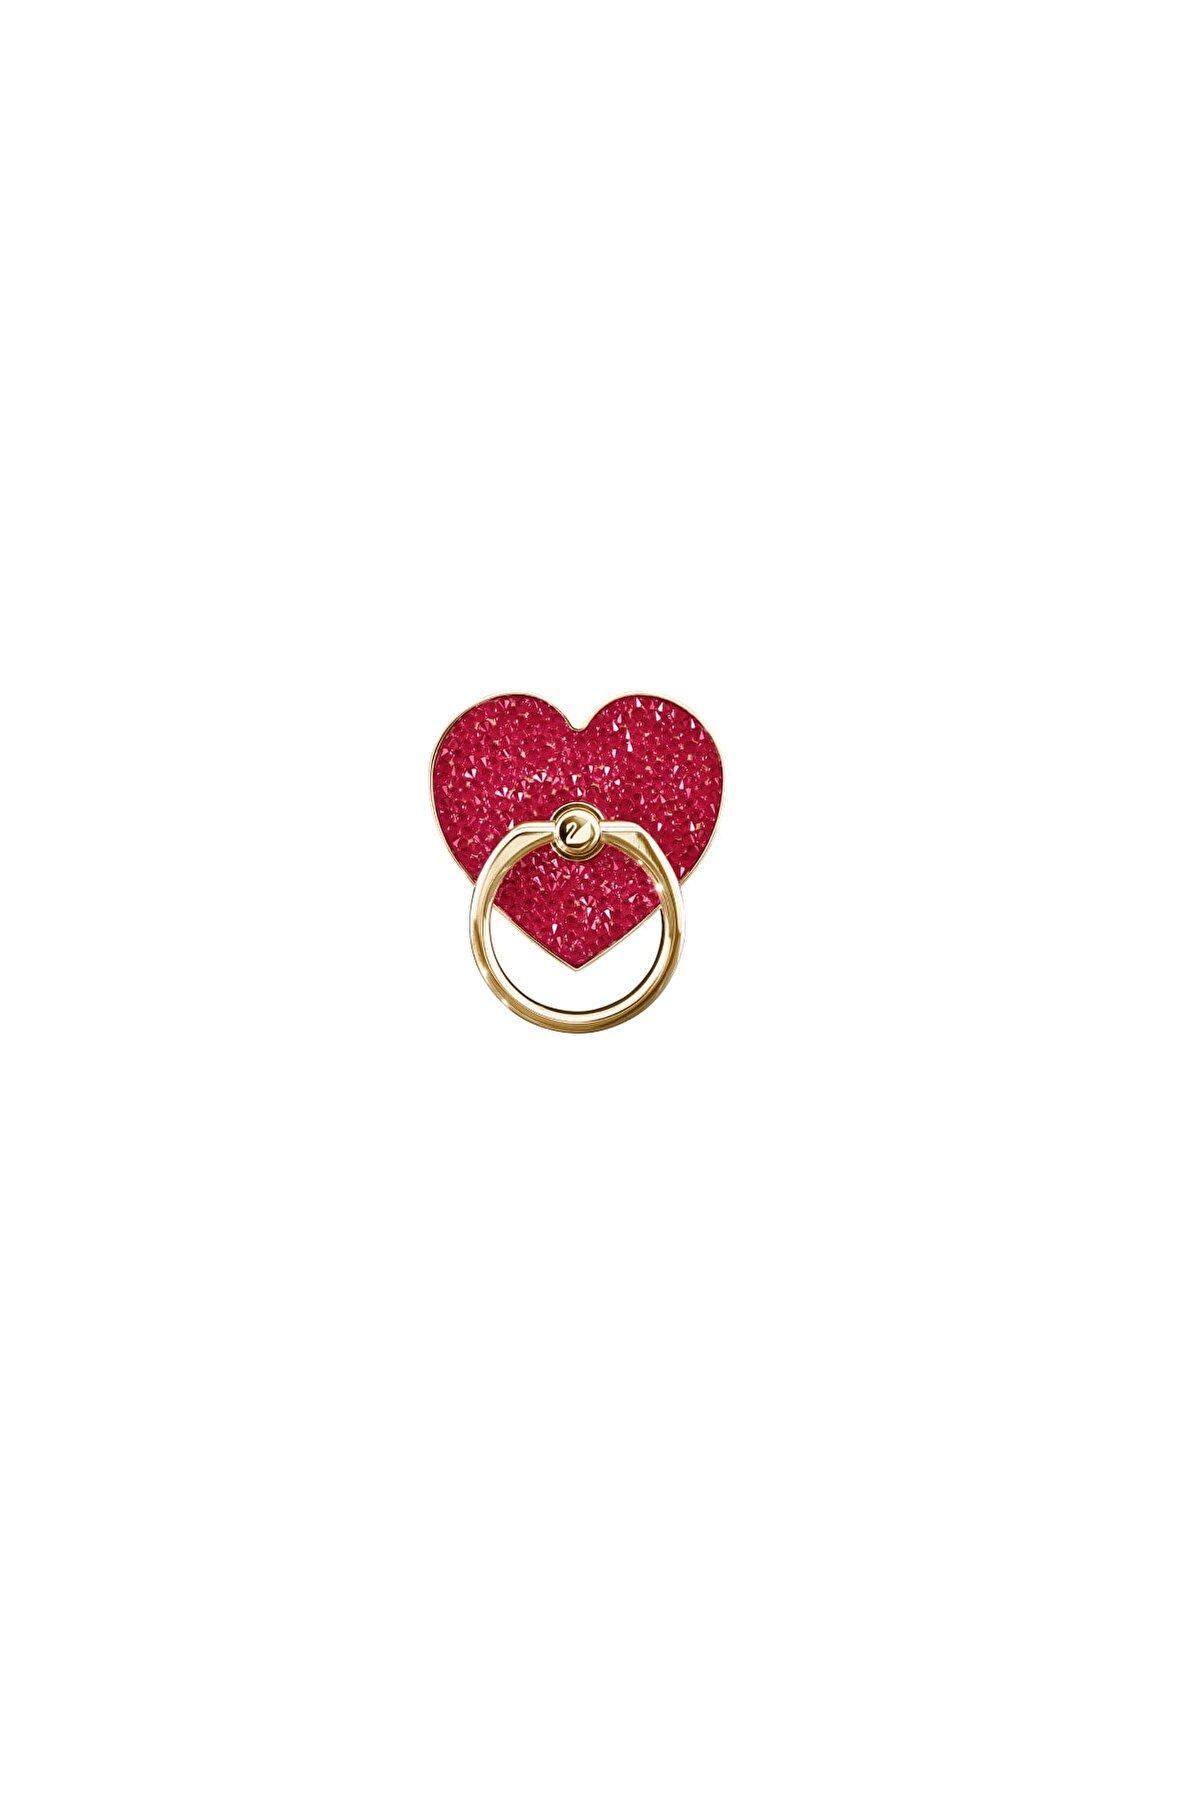 Swarovski Telefon Kılıfı Glam Rock H Ring:stickers Red/sts Plg 5457473